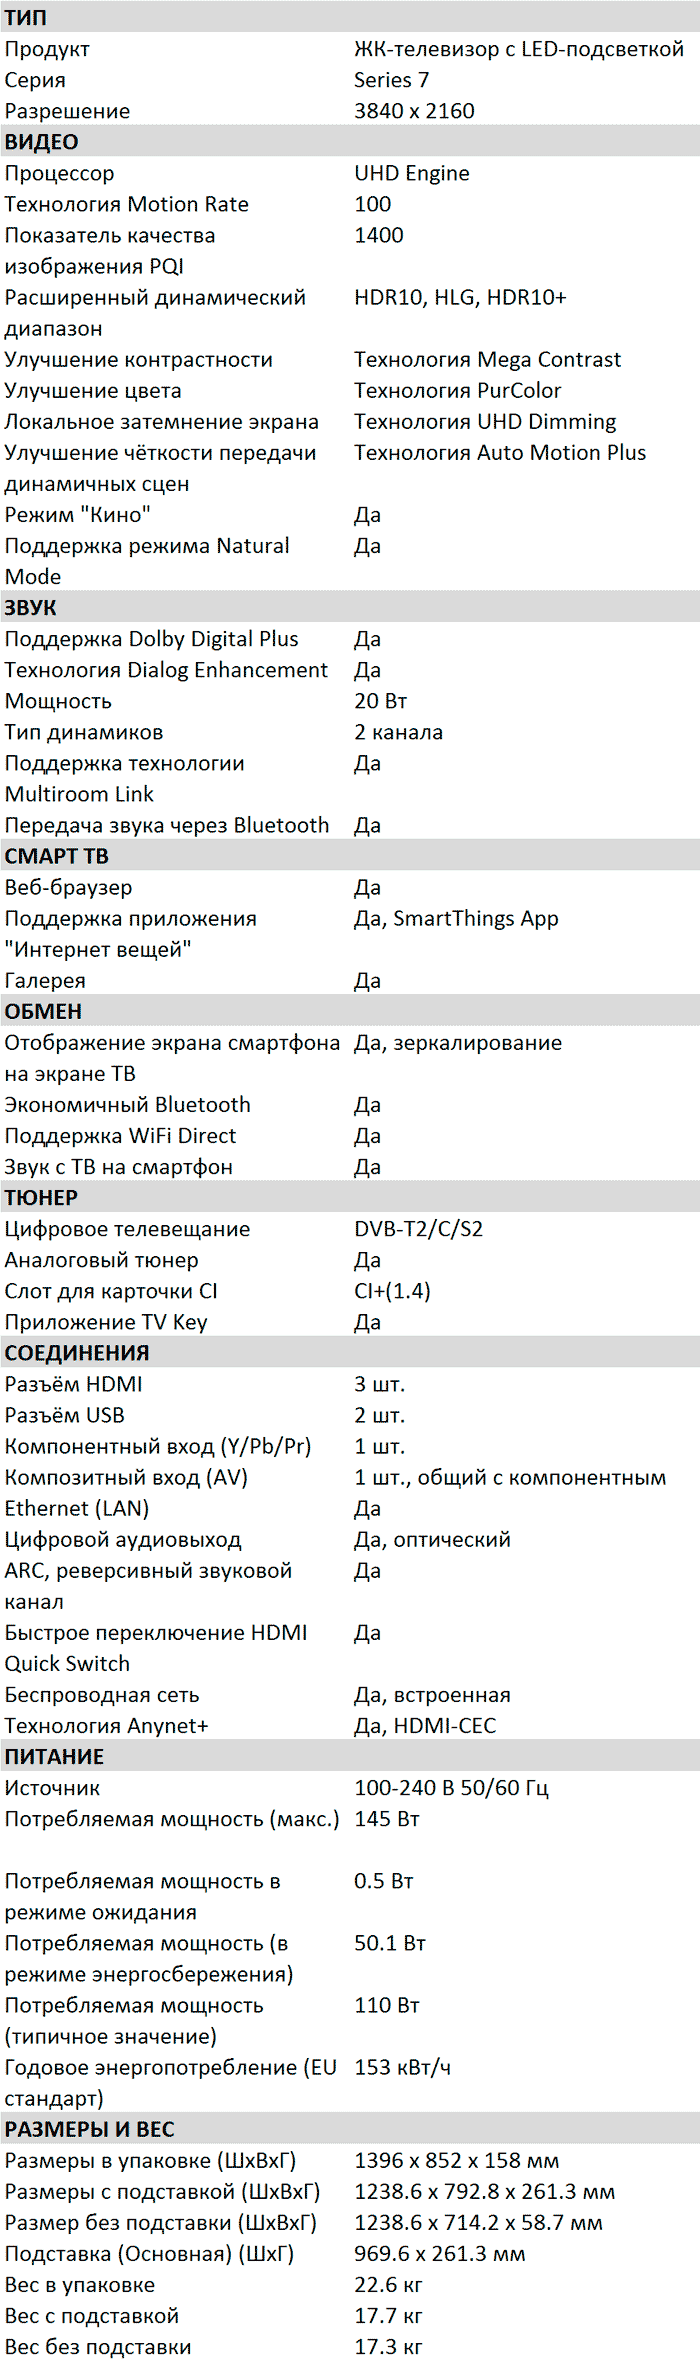 Характеристики RU7100